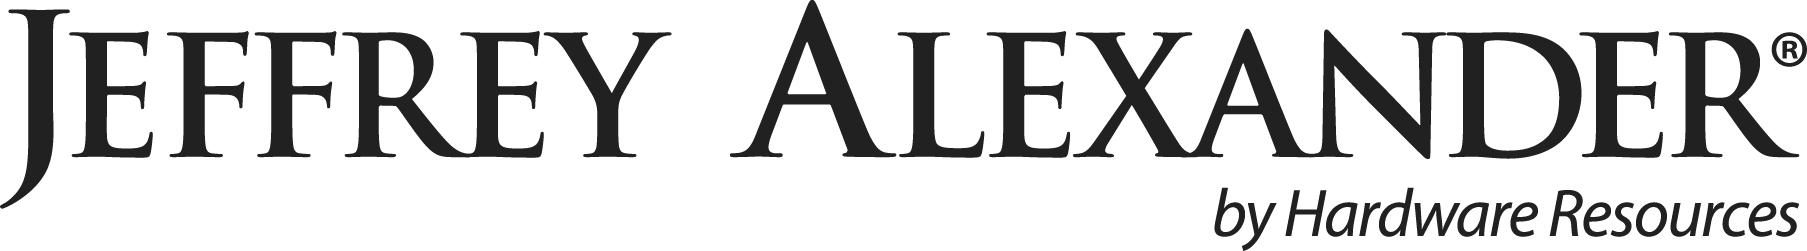 Jeffrey Alexander- islands, hardware, vanities and more craftsman home products